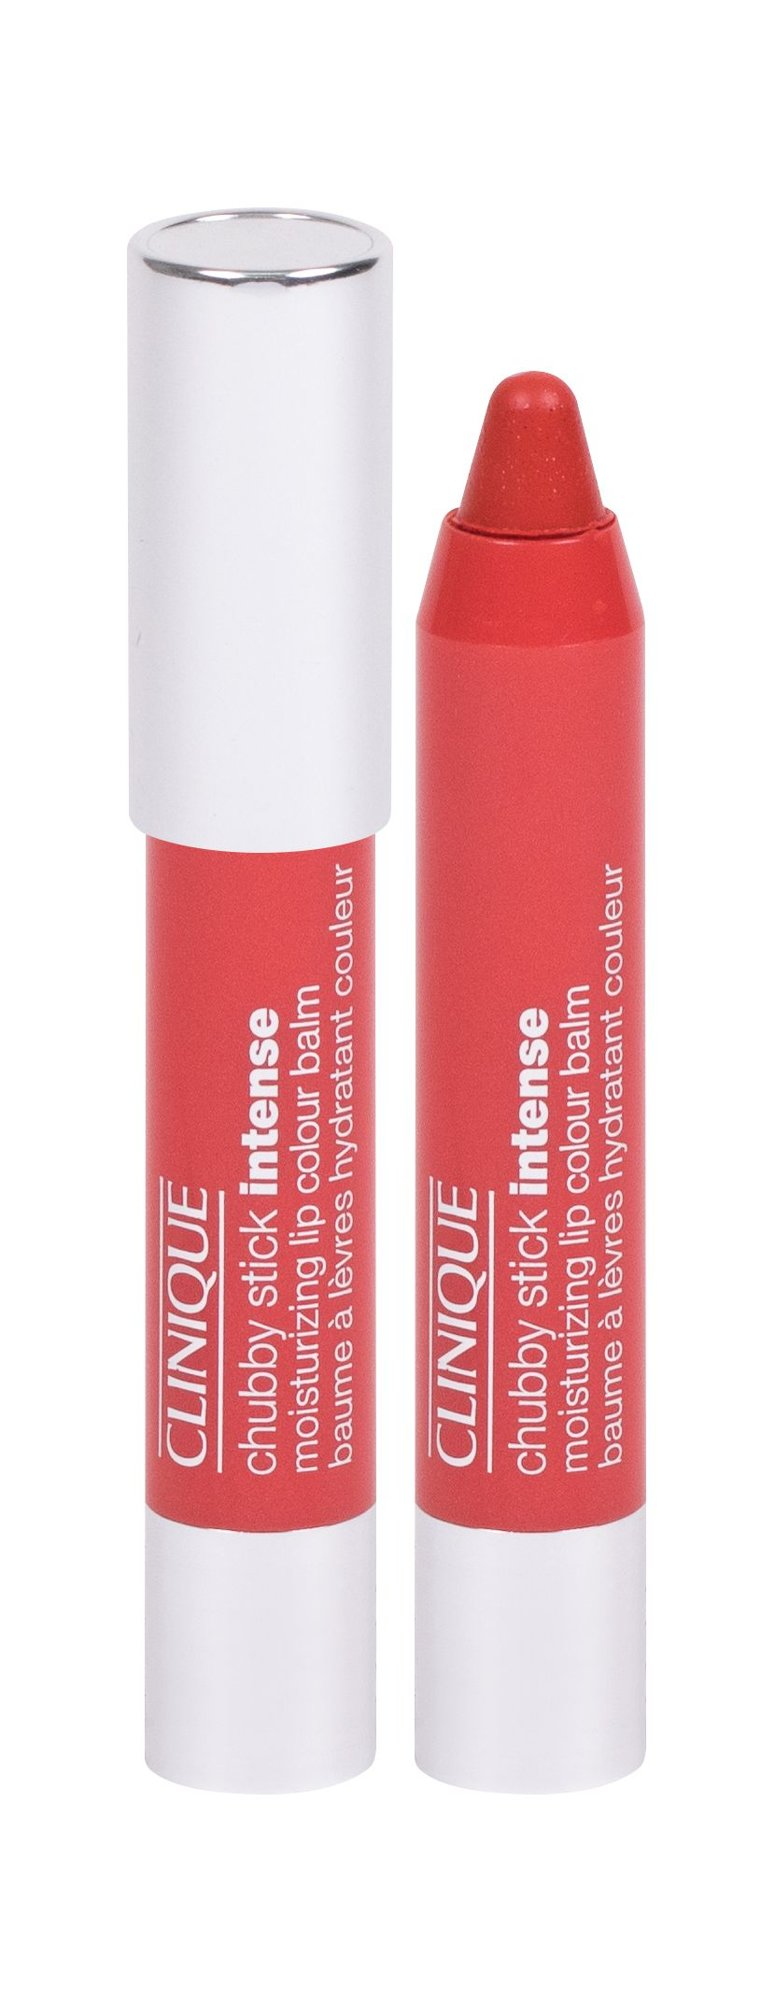 Clinique Chubby Stick Lipstick 3ml 04 Heftiest Hibiscus